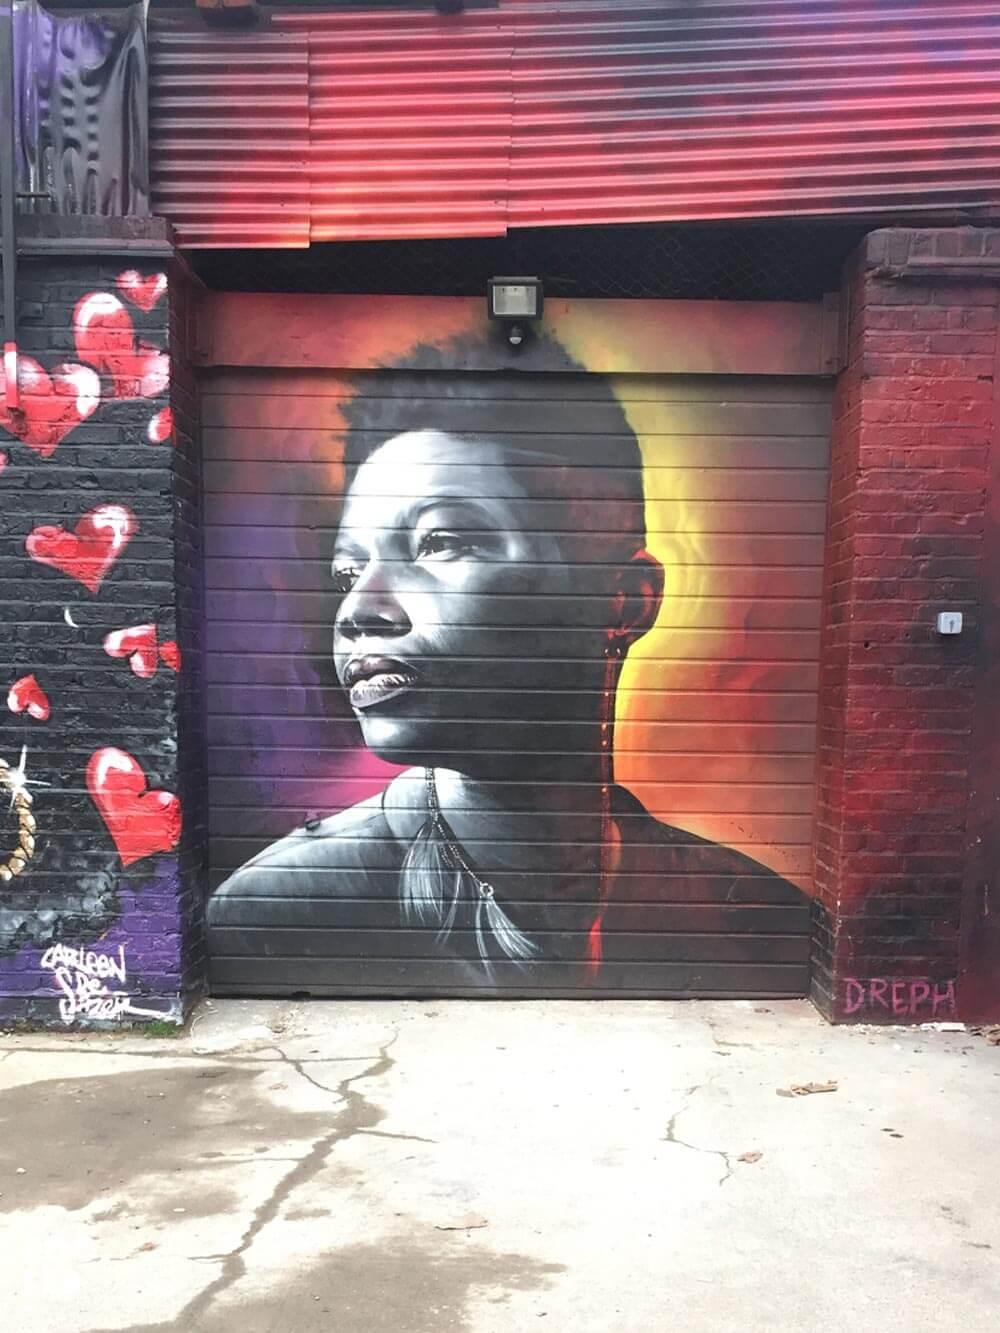 03. Seven Stars Yard, London street art by artist Dreph